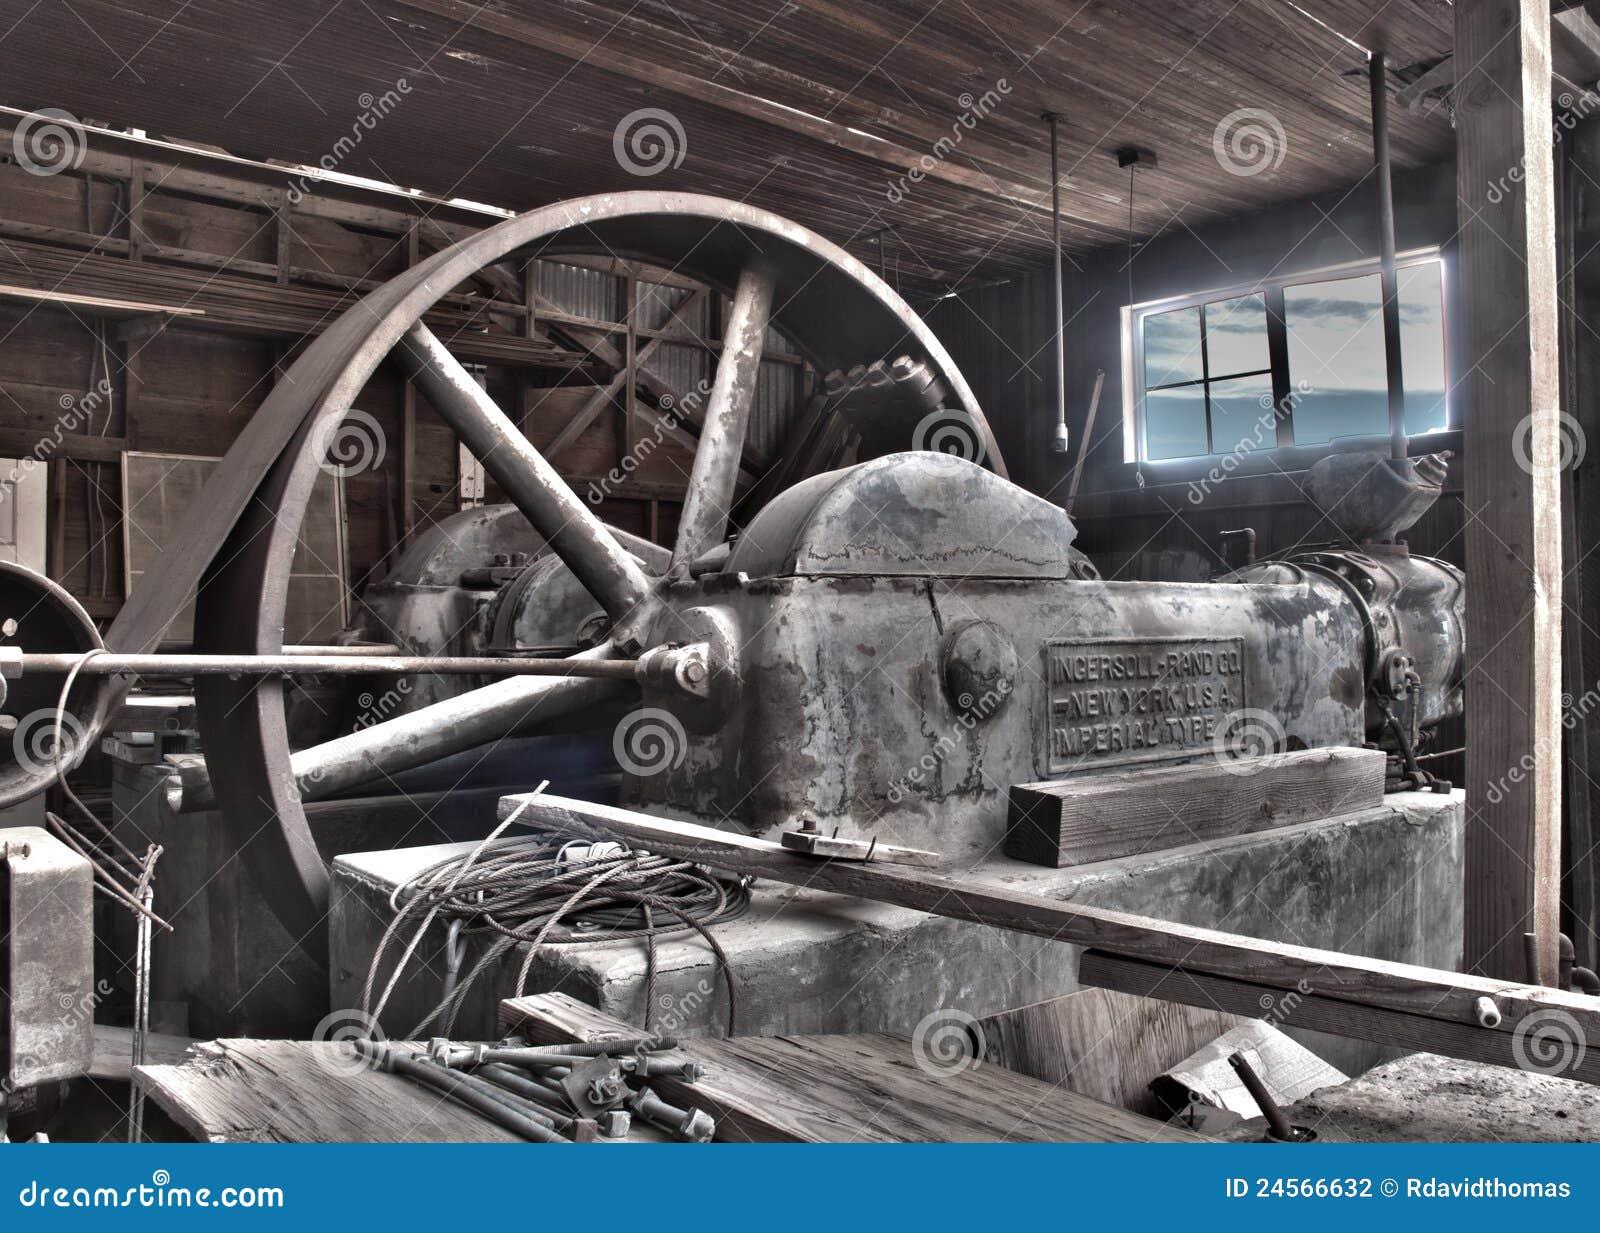 Antique Belt Driven Steam Compressor